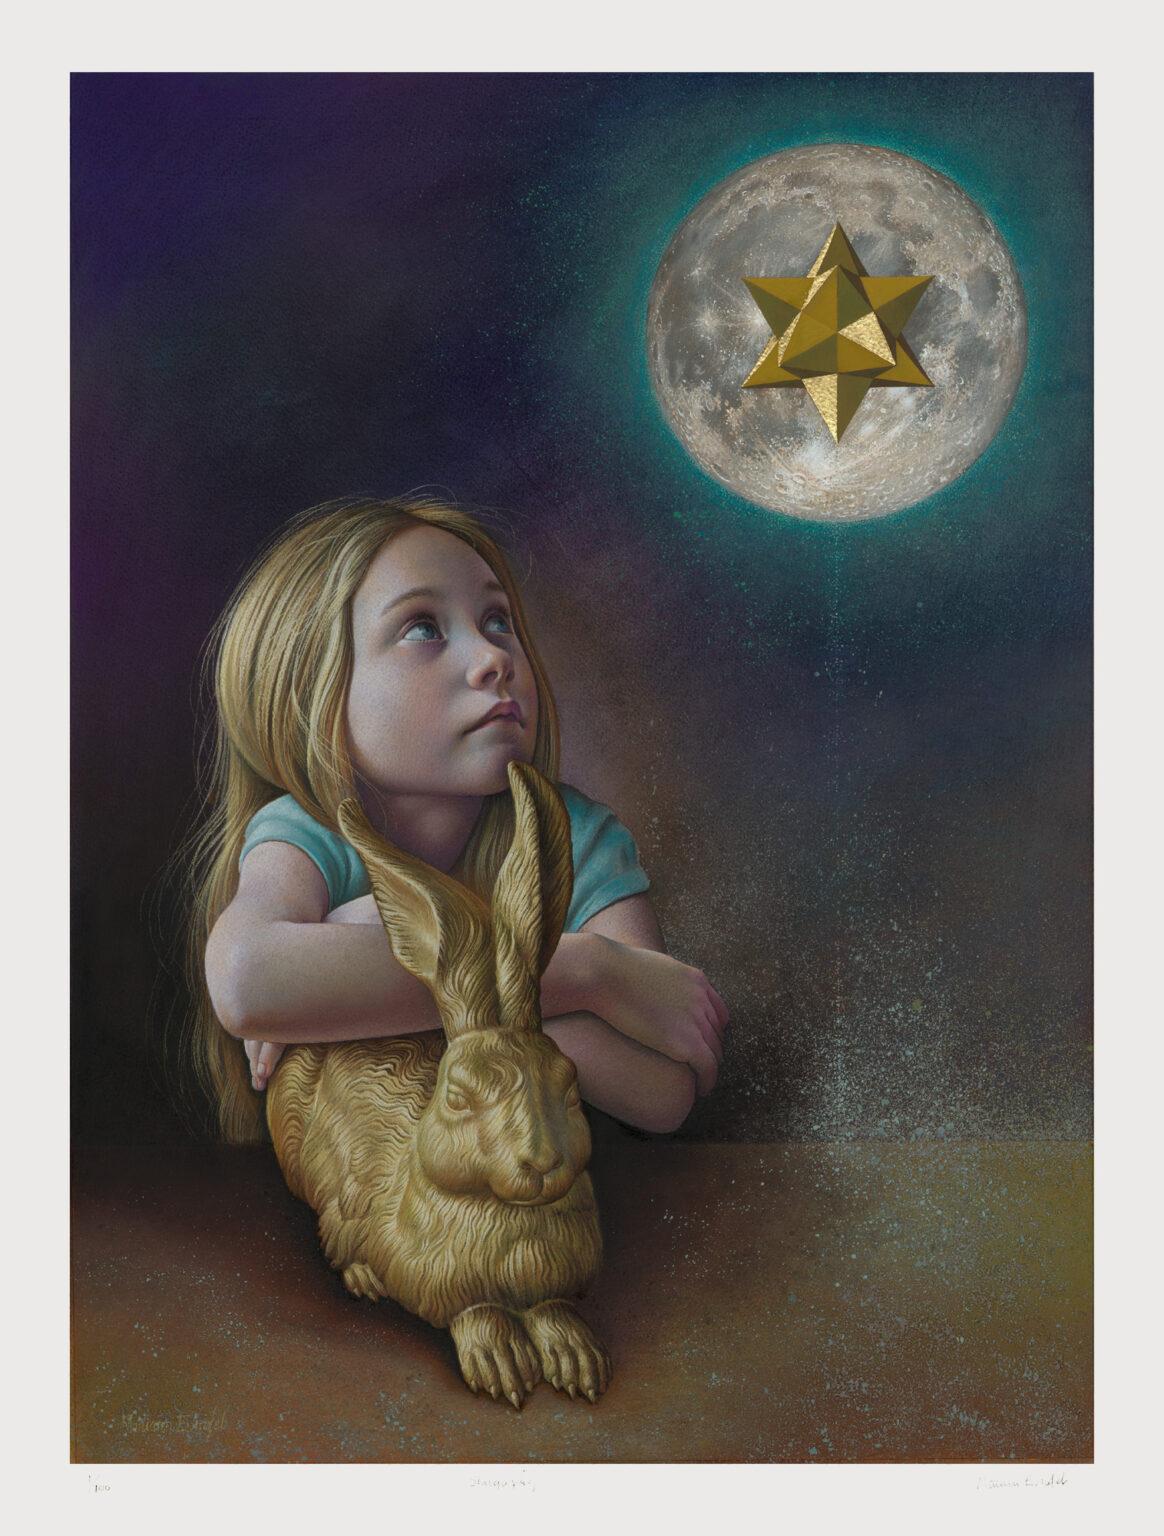 STARGZING-signed-limited-edition-print-Miriam-Escofet